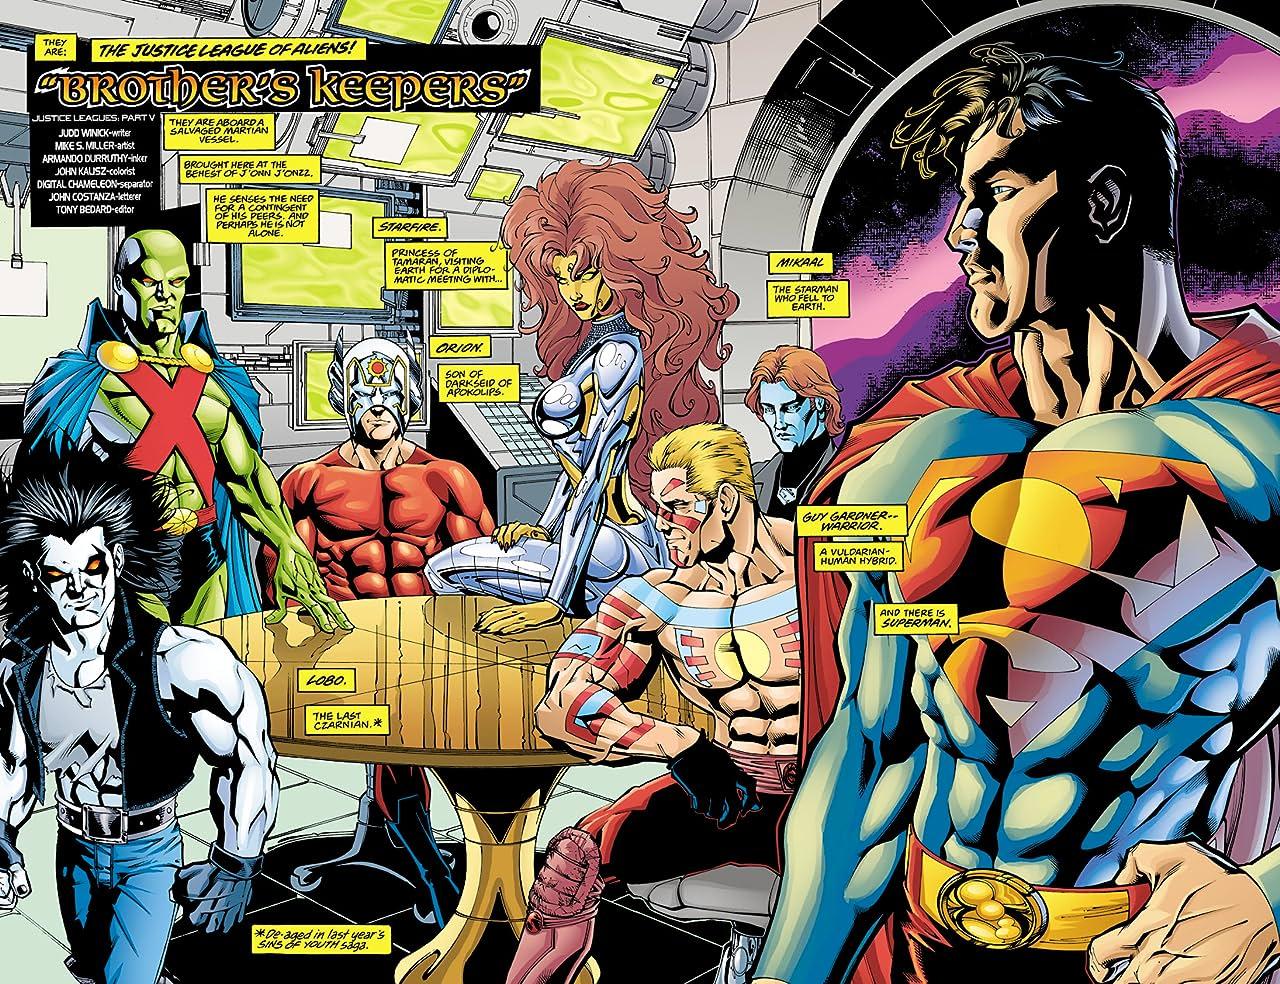 Justice Leagues (2001) #1: Justice League of Aliens